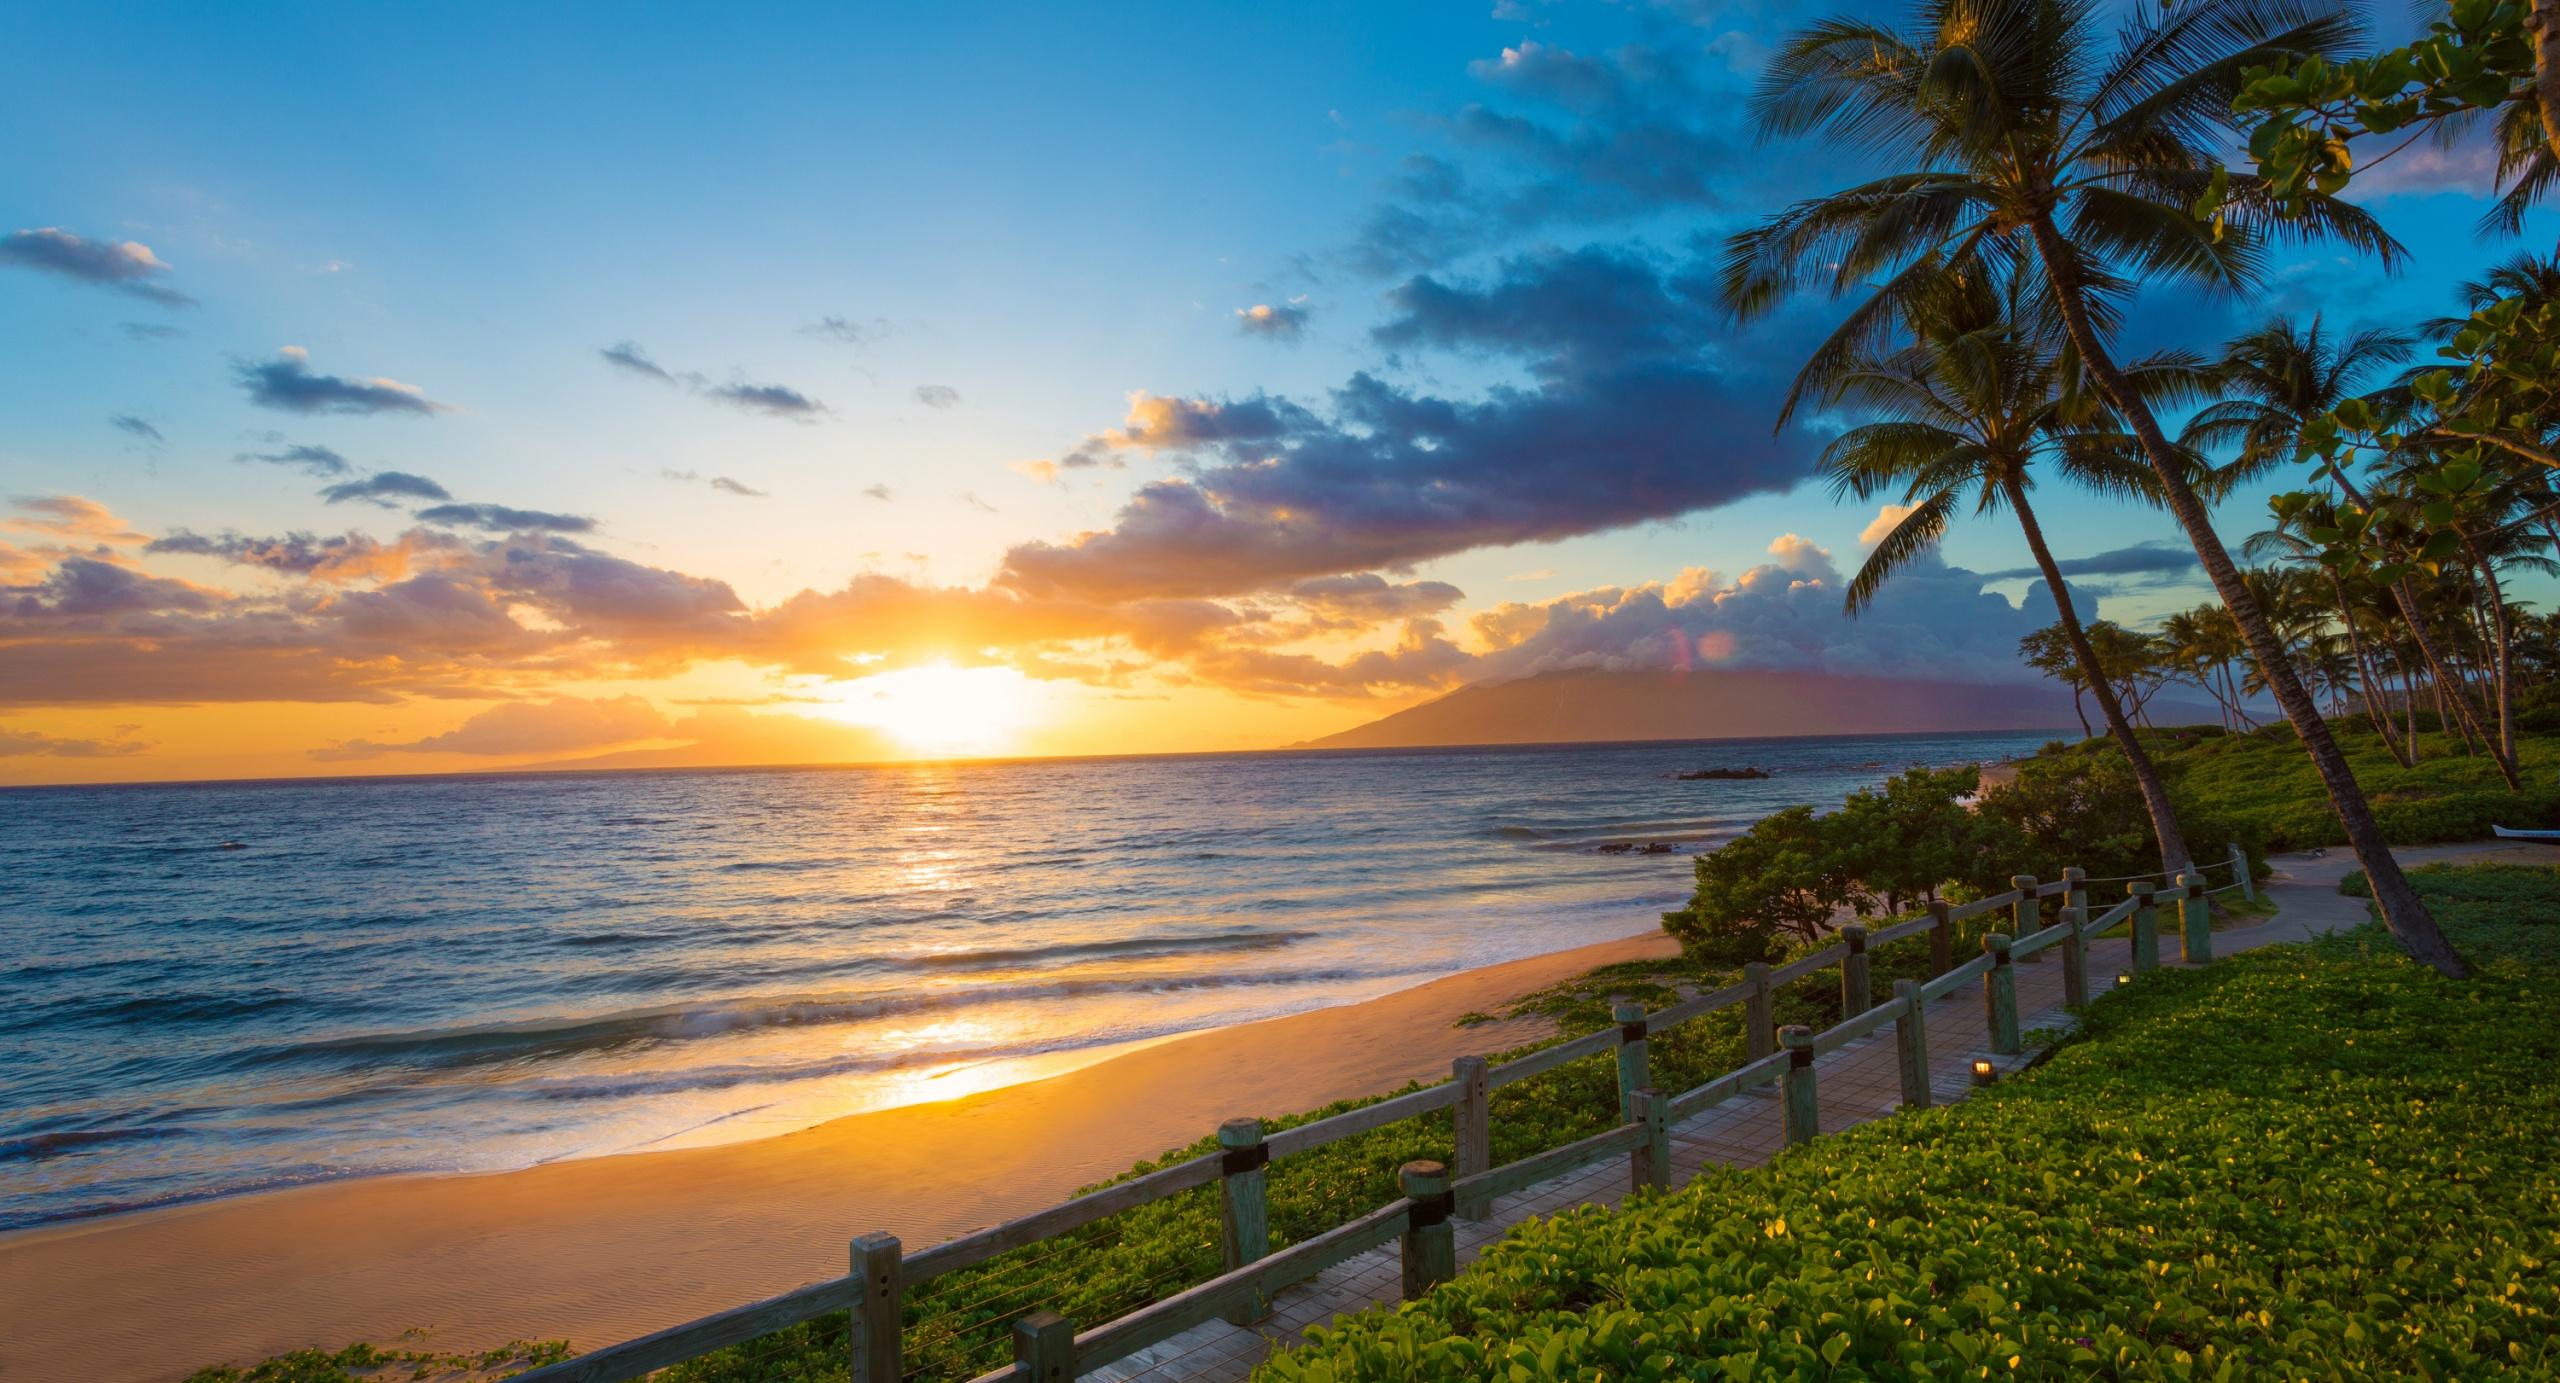 Vietnam seaside